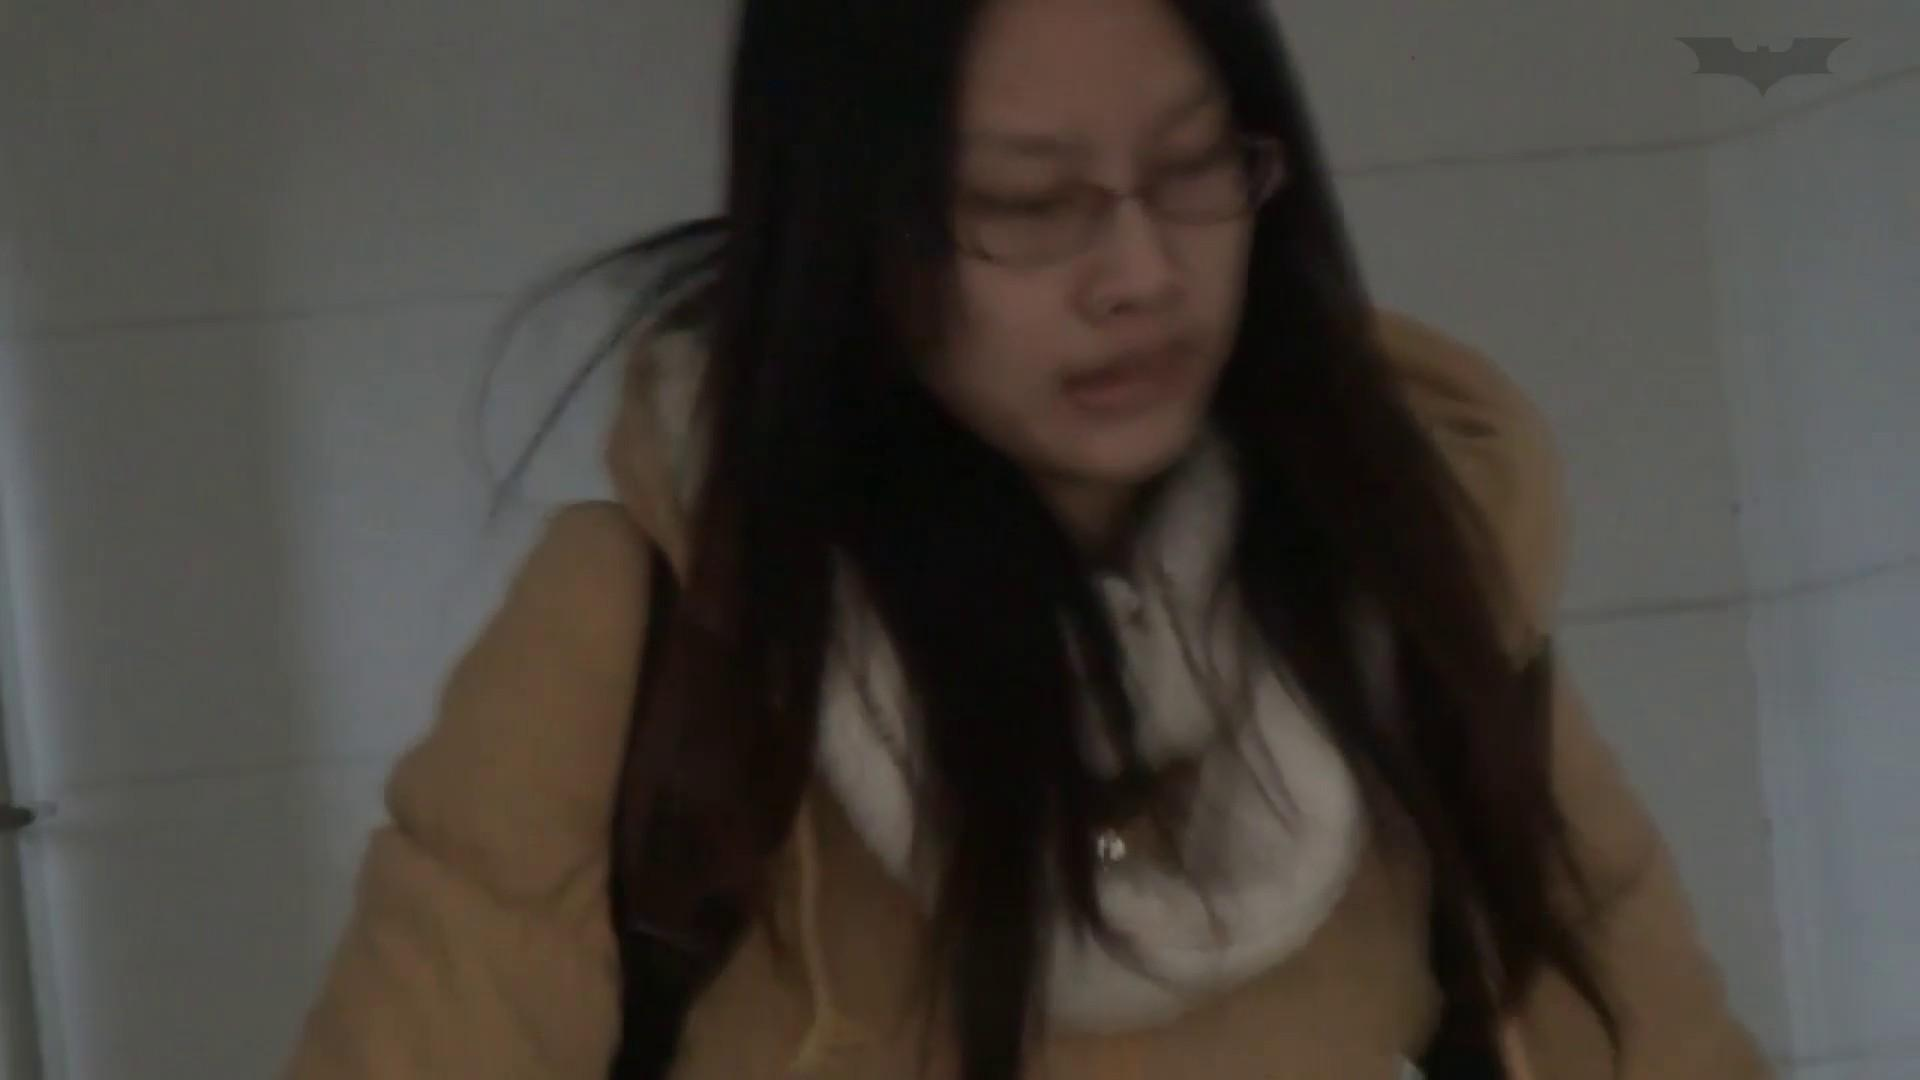 JD盗撮 美女の洗面所の秘密 Vol.55 美女 AV無料動画キャプチャ 91画像 58